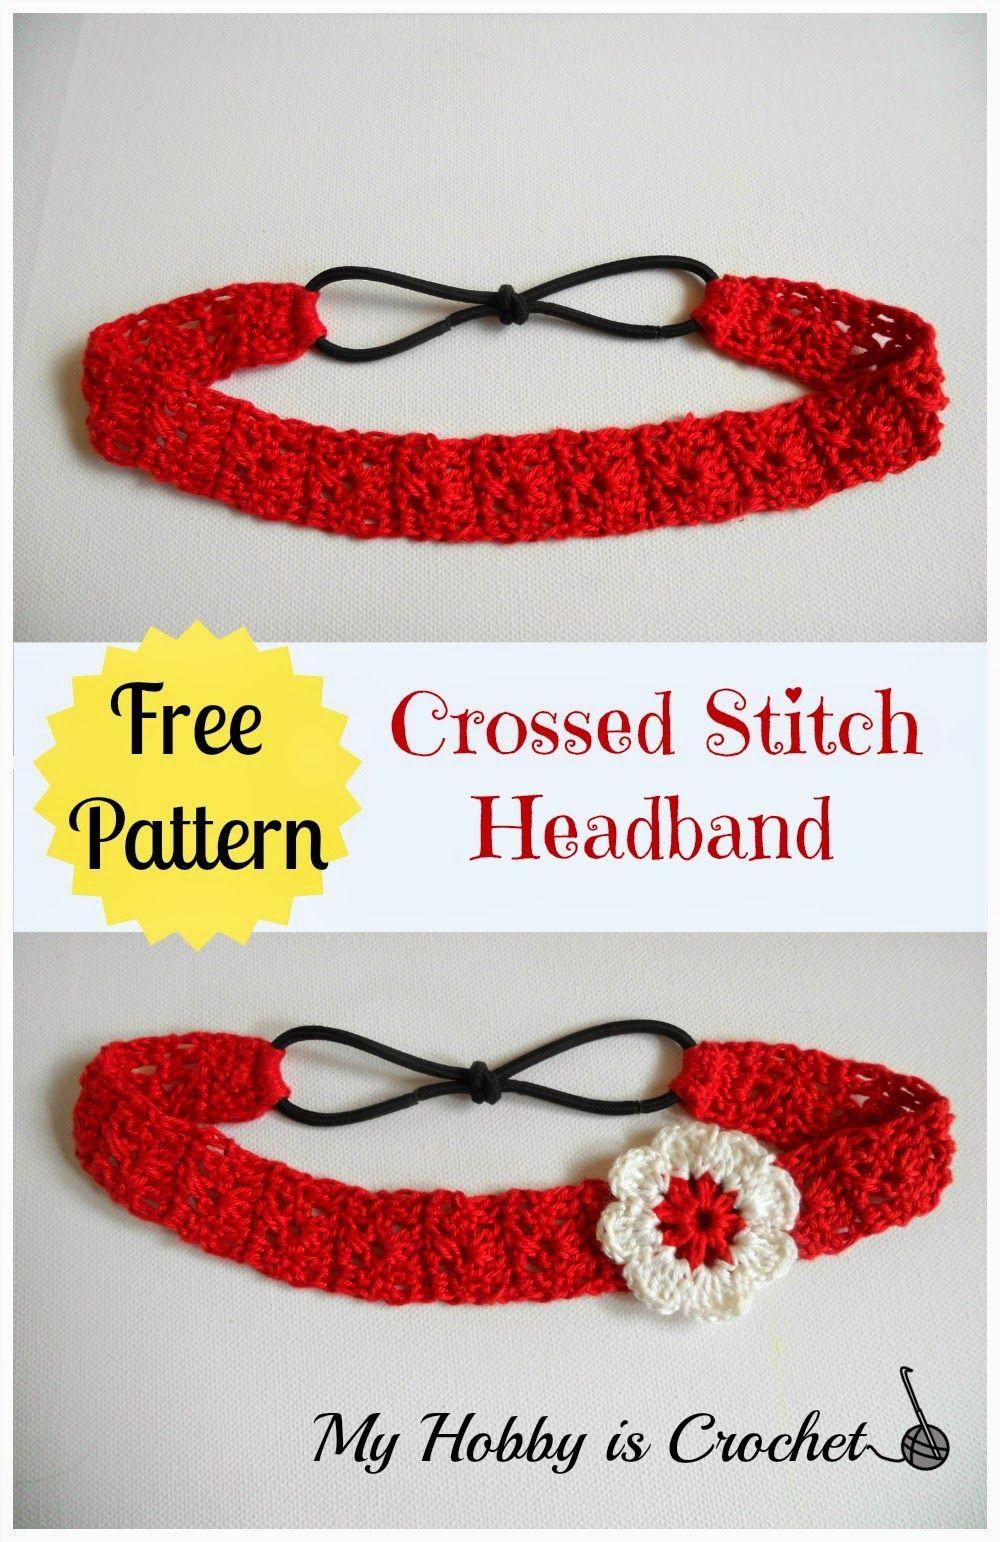 My Hobby Is Crochet | Crochet and knit | Pinterest | Ganchillo ...